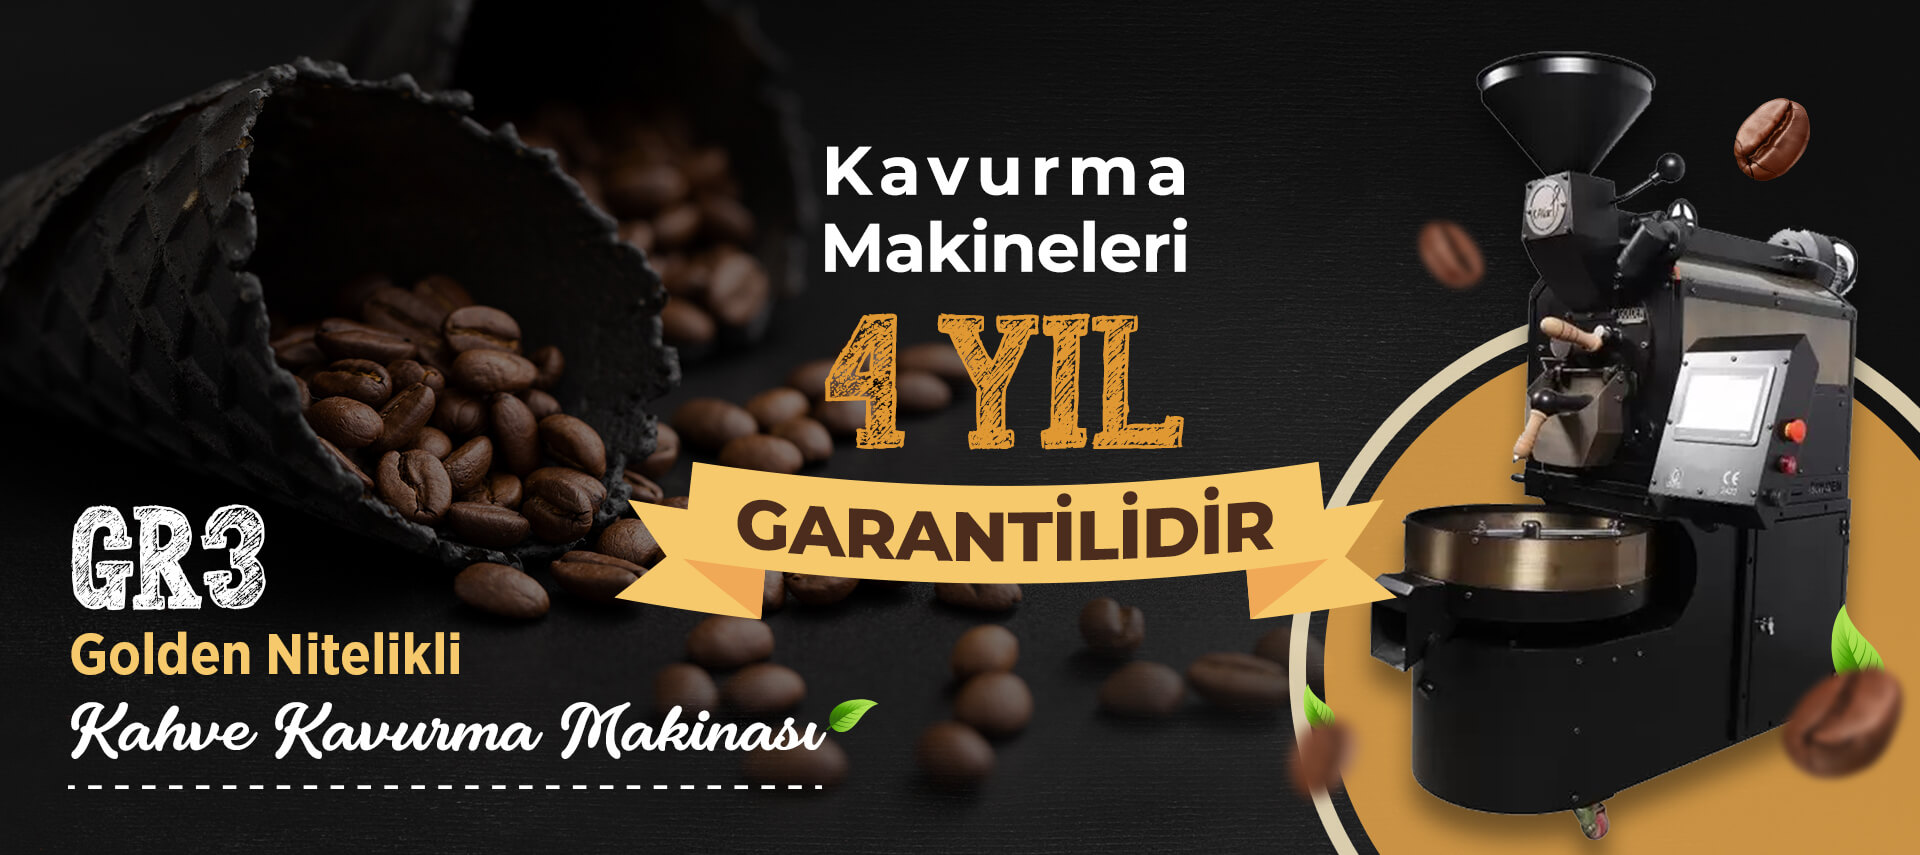 nazar kahve banner2